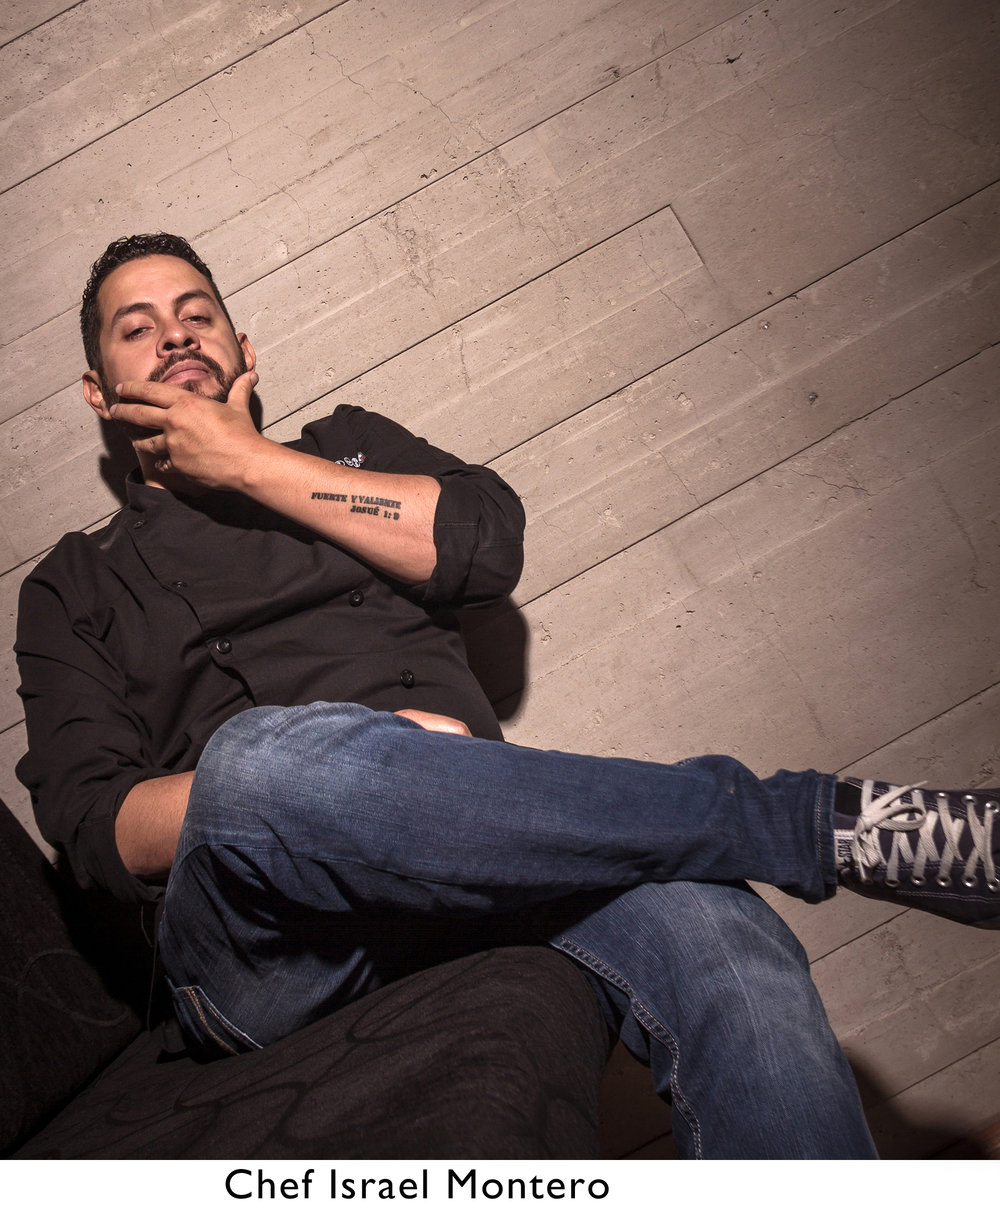 Raiz_chef_Israel_Montero.jpg